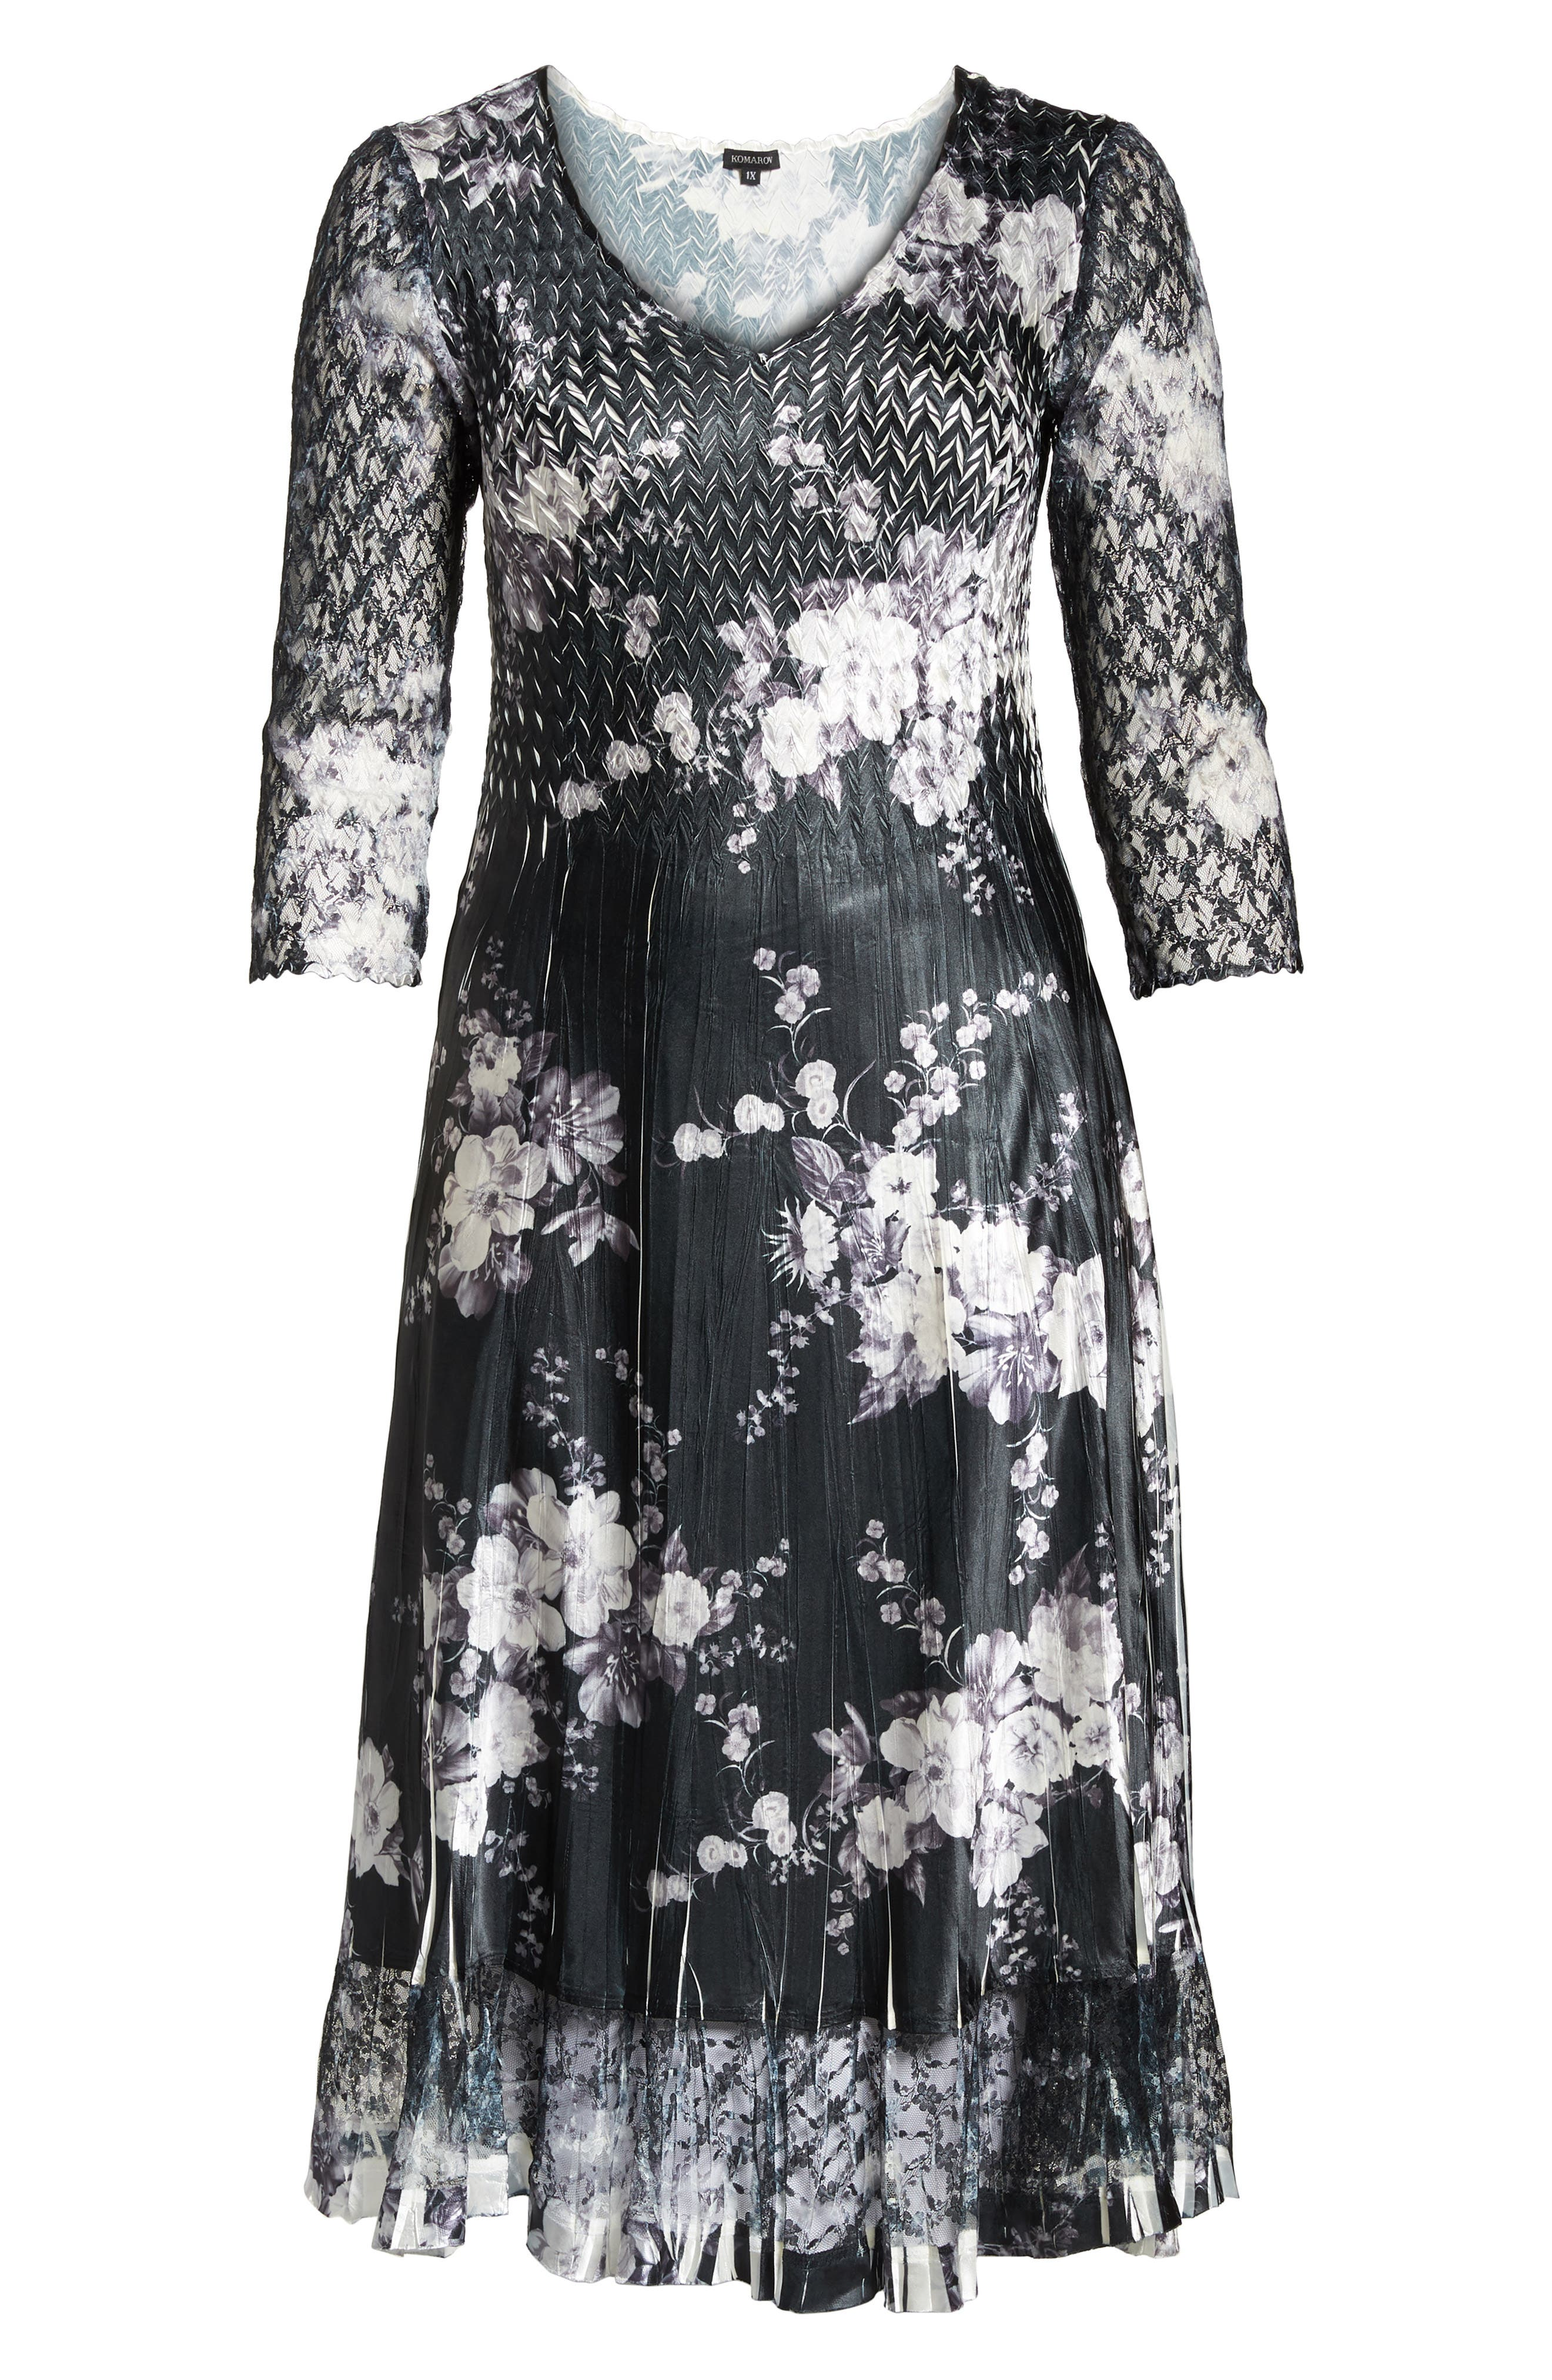 Lace & Charmeuse A-Line Dress,                             Alternate thumbnail 6, color,                             Eclipse Meadow